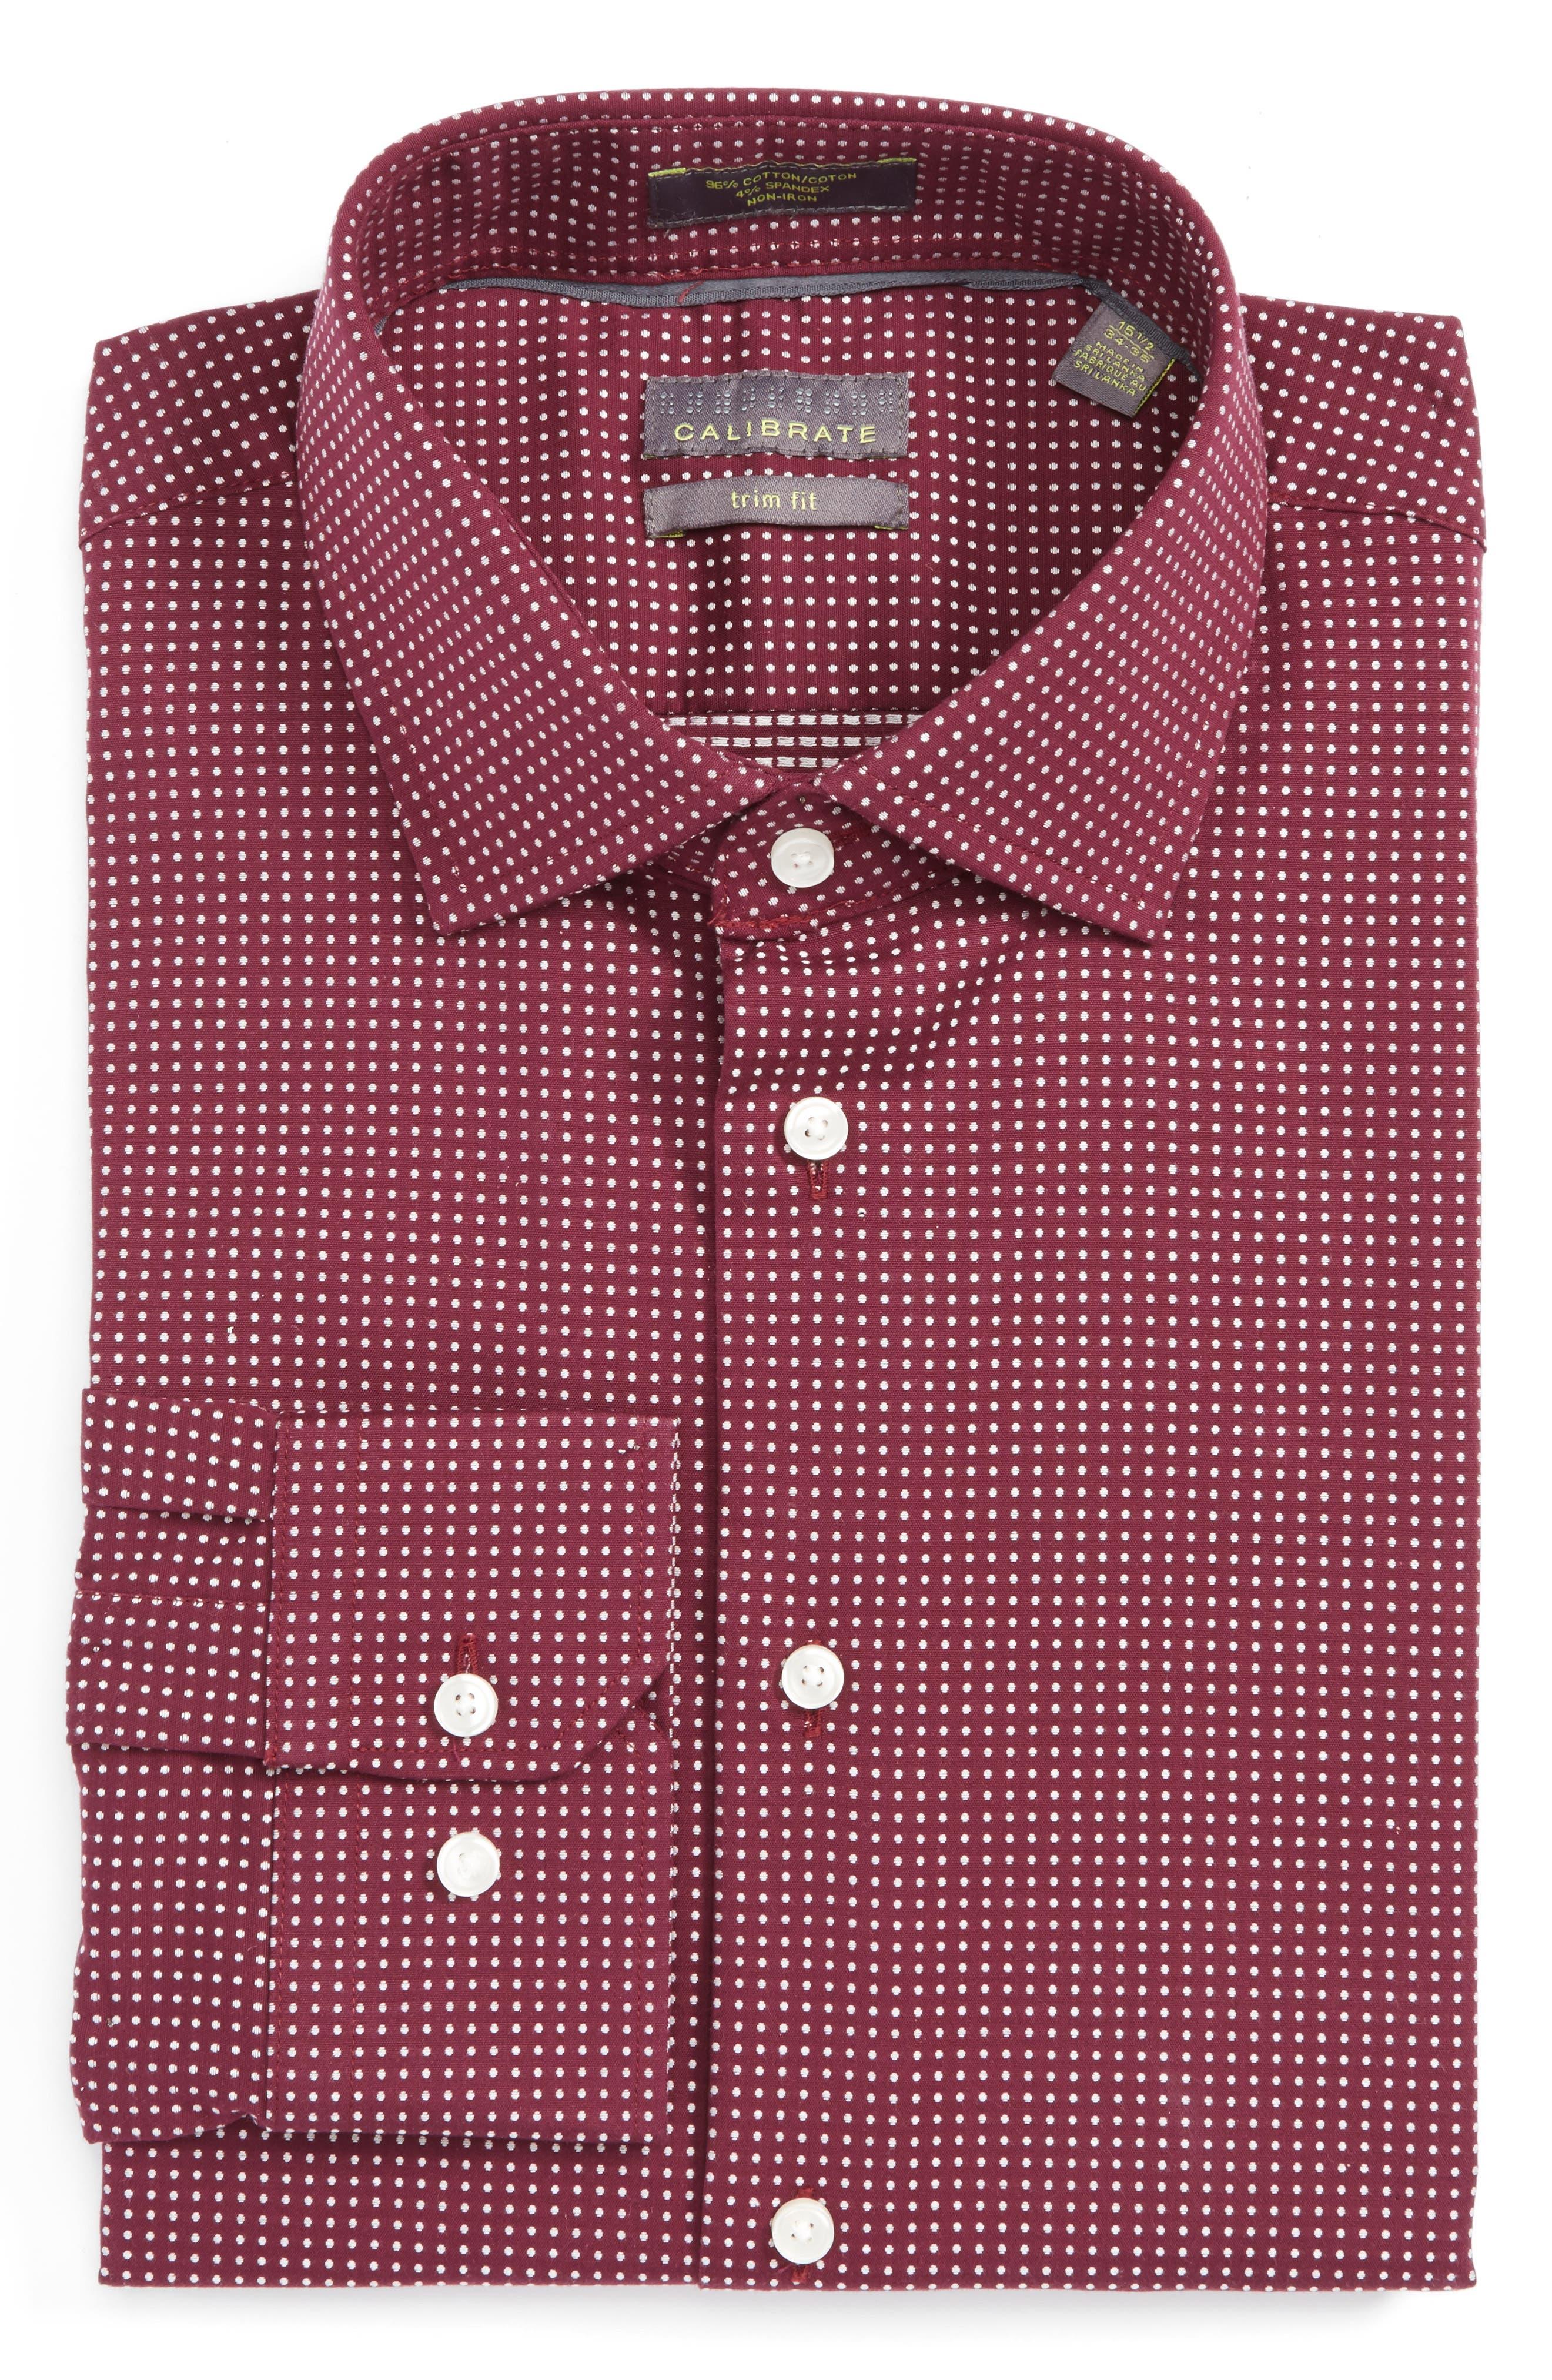 Main Image - Calibrate Trim Fit Non-Iron Dot Stretch Dress Shirt